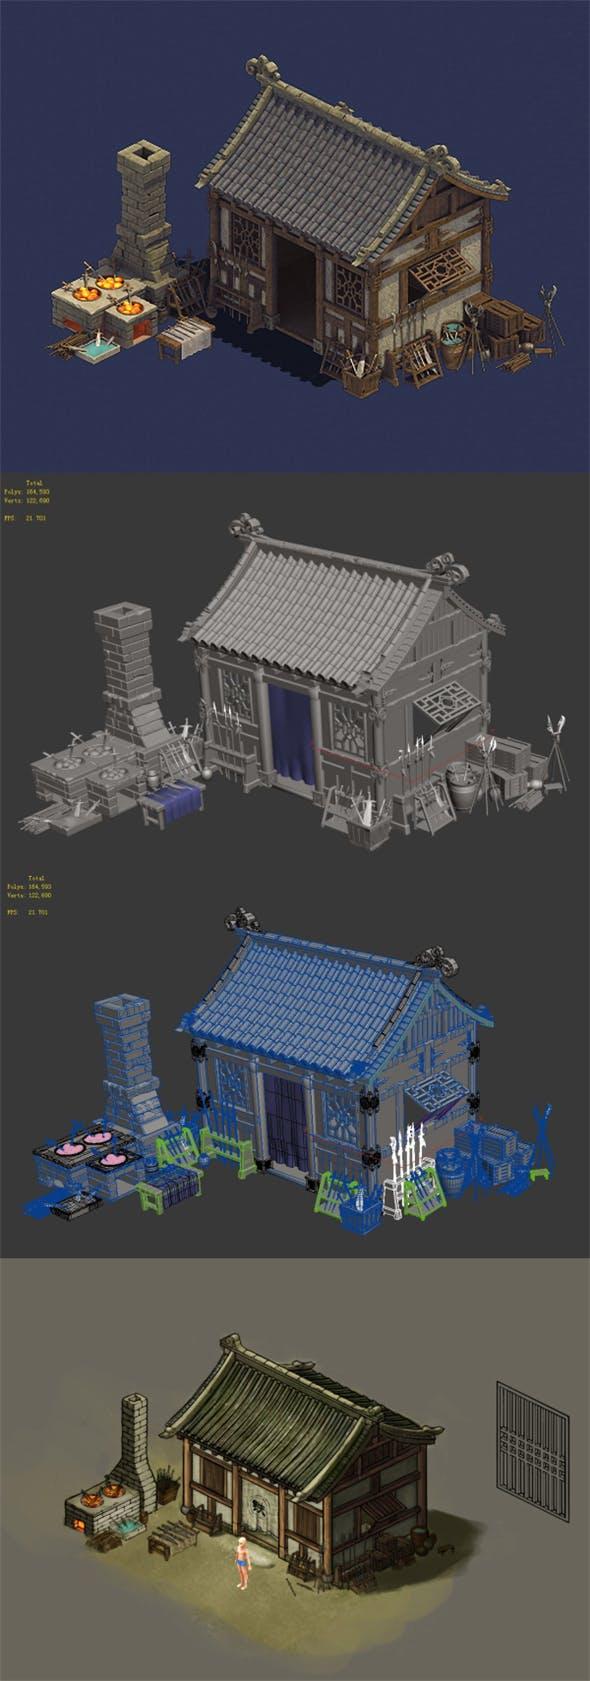 Gang - weapon blacksmith shop 01 - 3DOcean Item for Sale